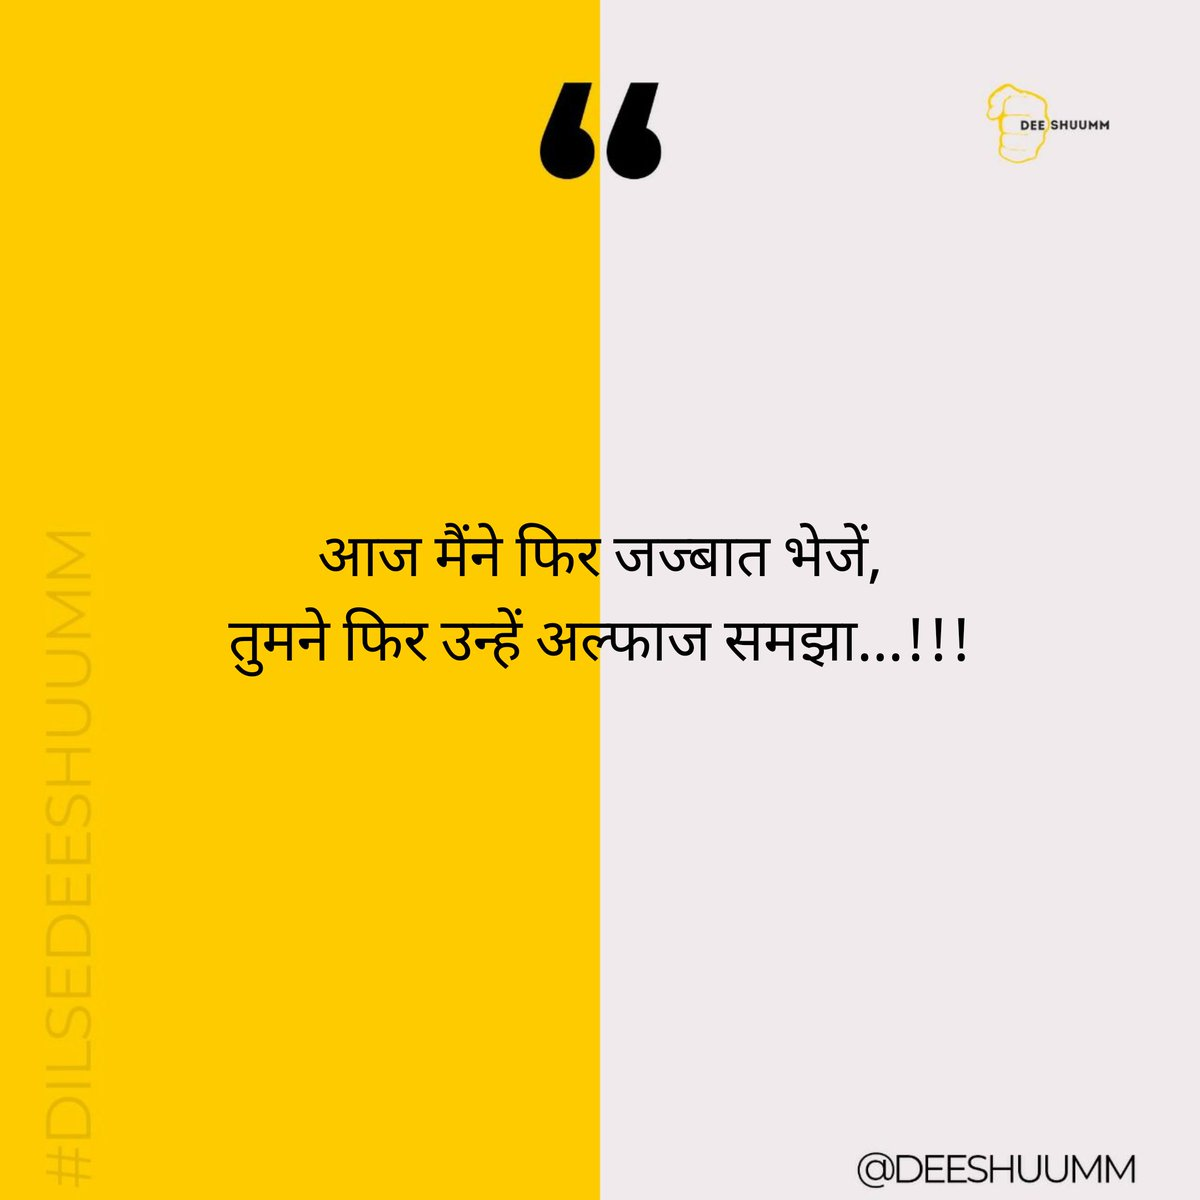 If You Feel Connected RT Now! #shayari #love #poetry #urdu #urdupoetry #shayarilover #hindi #shayar #quotes #hindishayari #lovequotes #rekhta #follow #urdushayari #loveshayari #hindipoetry #ishq #poet #like  #shayri #poetrycommunity #instashayari #sad #poem #mohabbat #deeshuumm https://t.co/XmGqChowHz